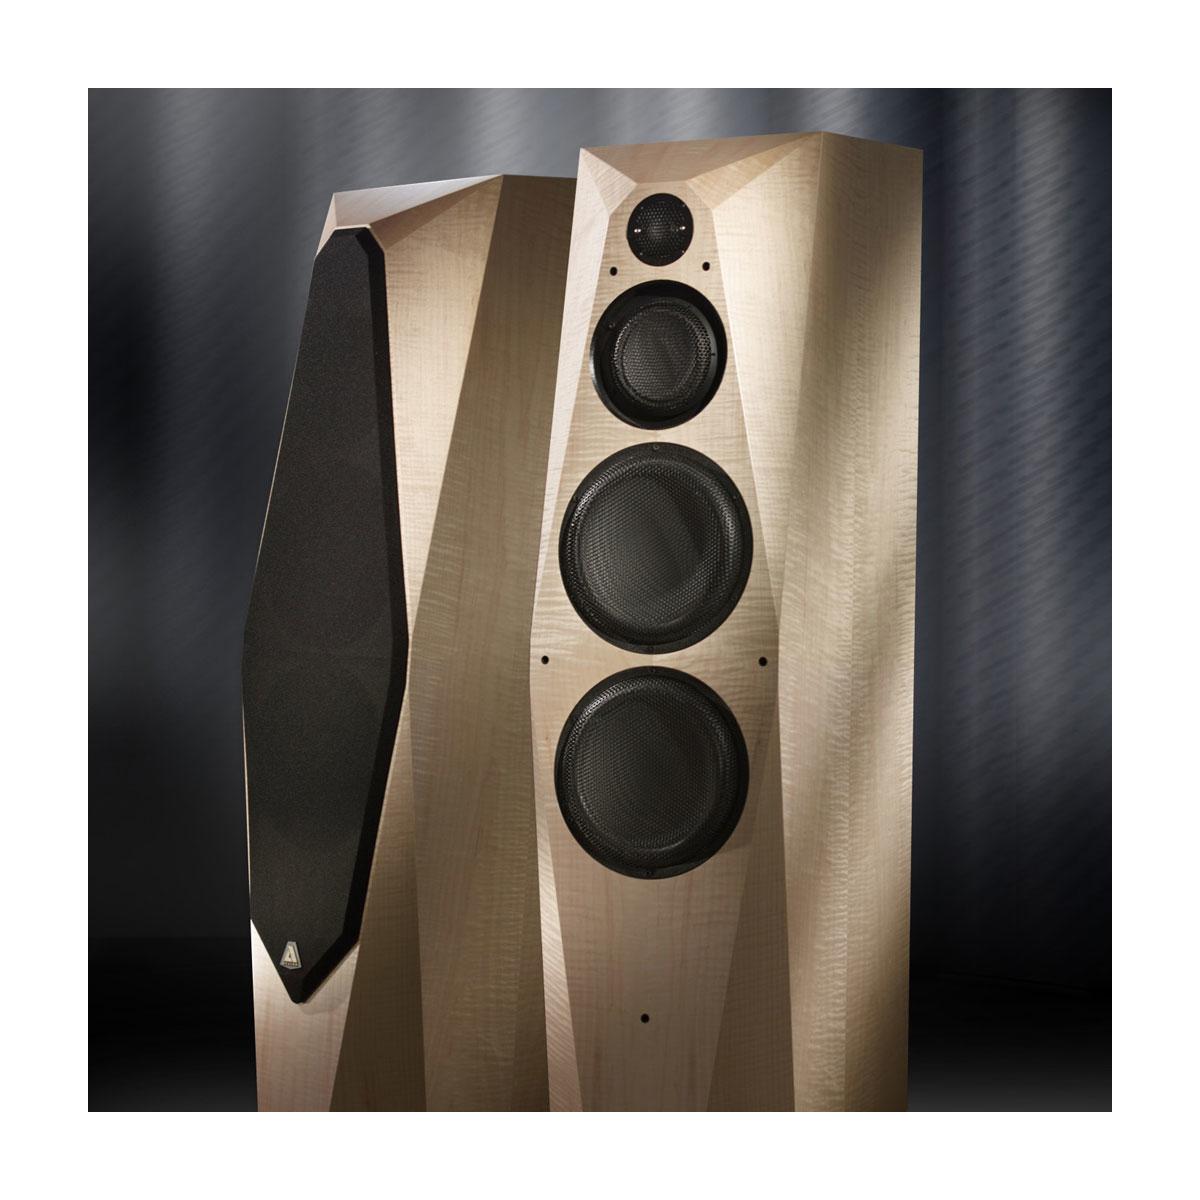 Avalon Acoustics Compas Cherry 特別価格ASK! アヴァロン スピーカーシステム ペア